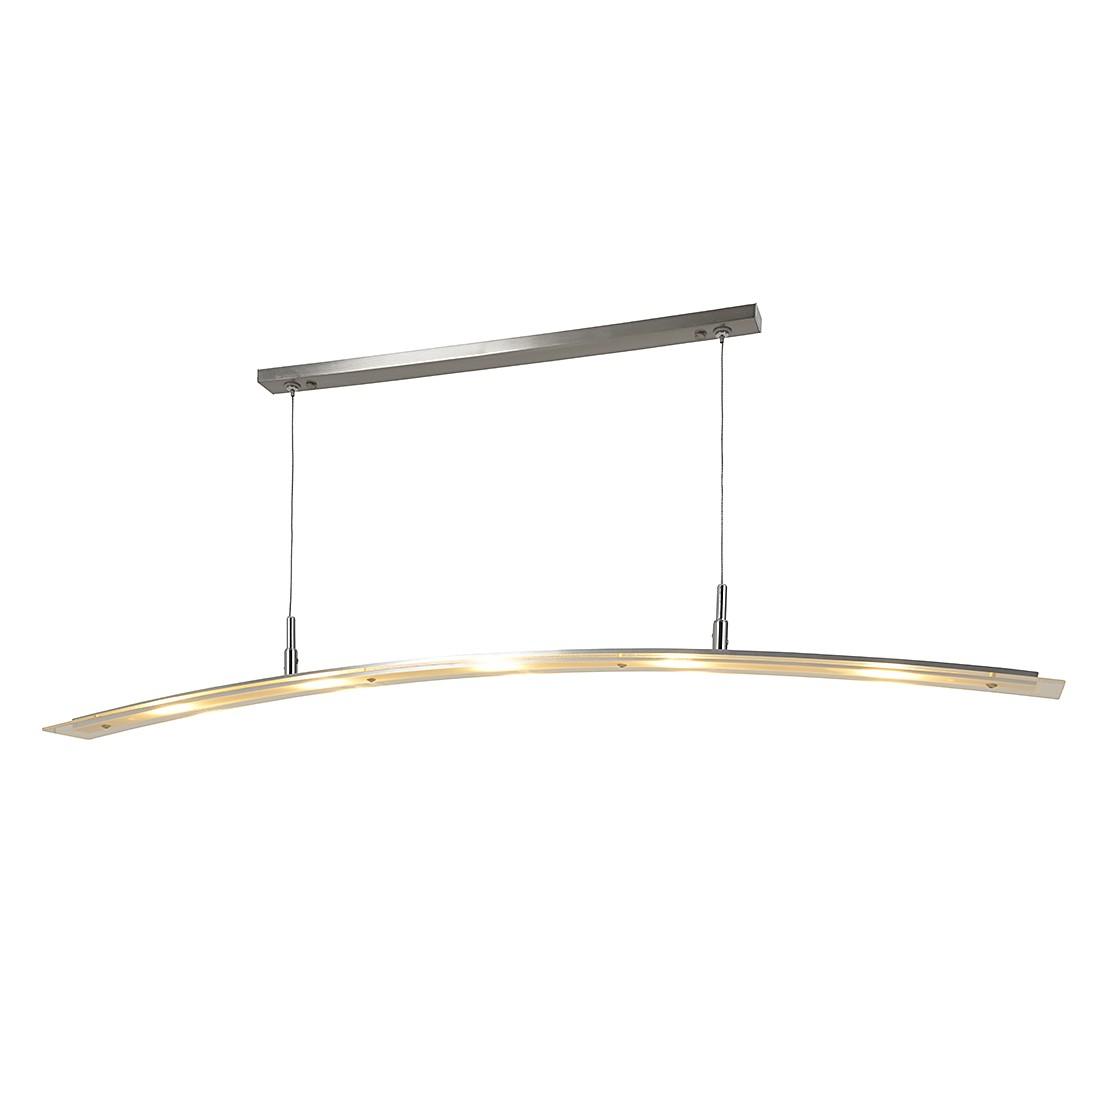 EEK A+, Pendelleuchte - Metall/Kunststoff - 5-flammig, Näve bei Home24 - Lampen